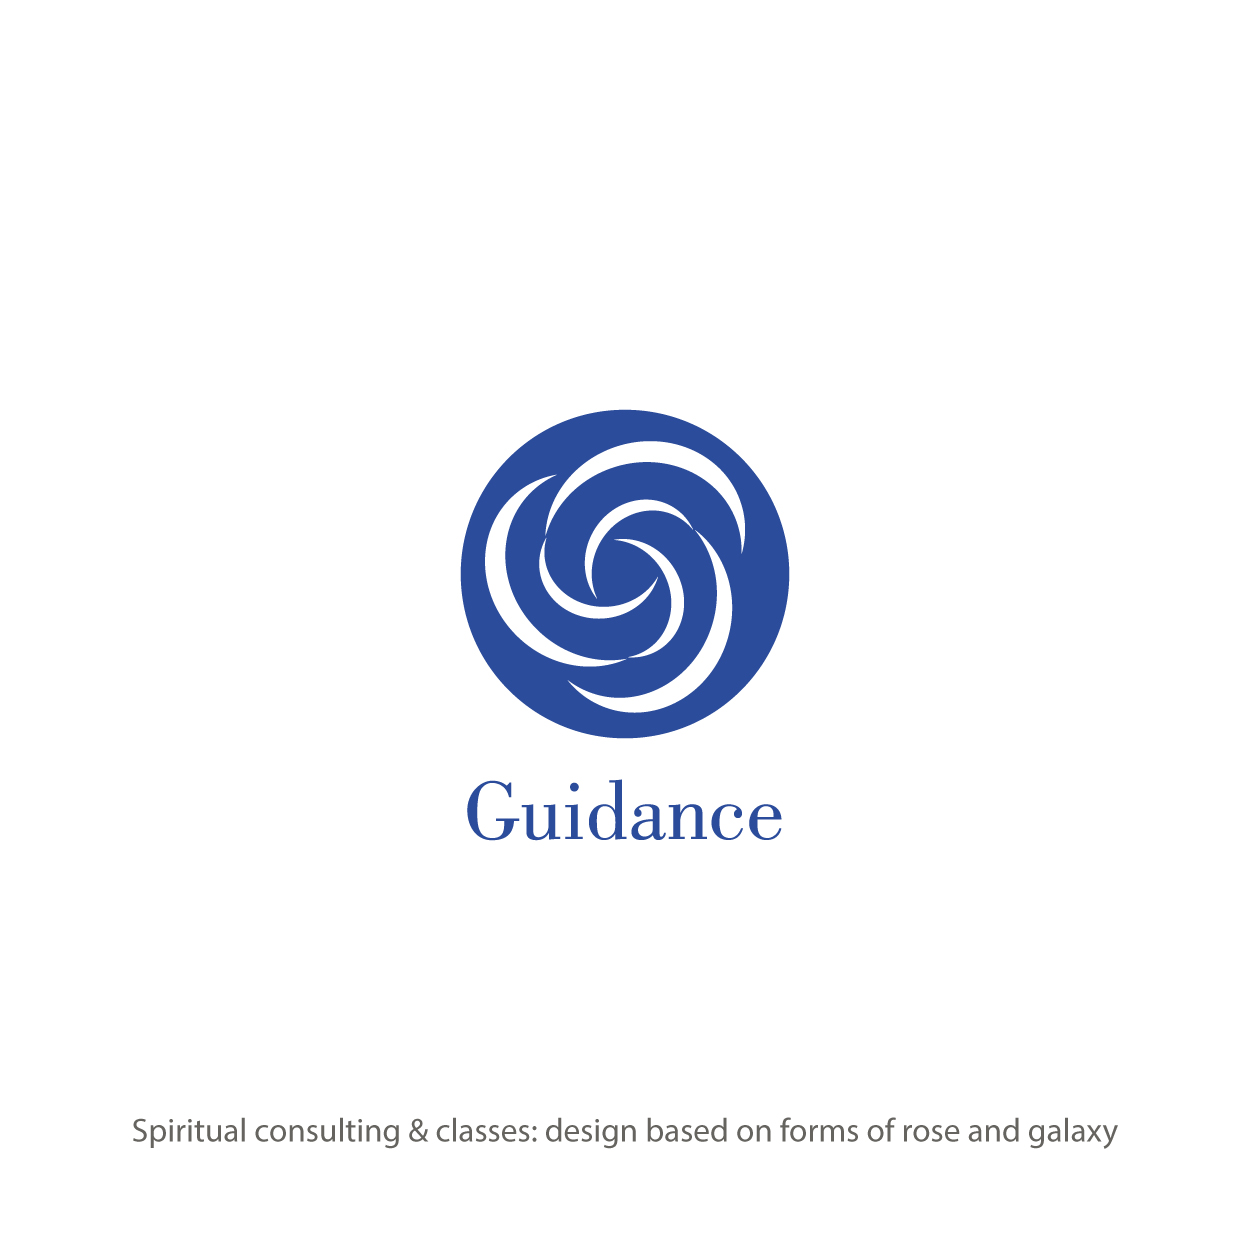 tjungle_design_logos-25.jpg